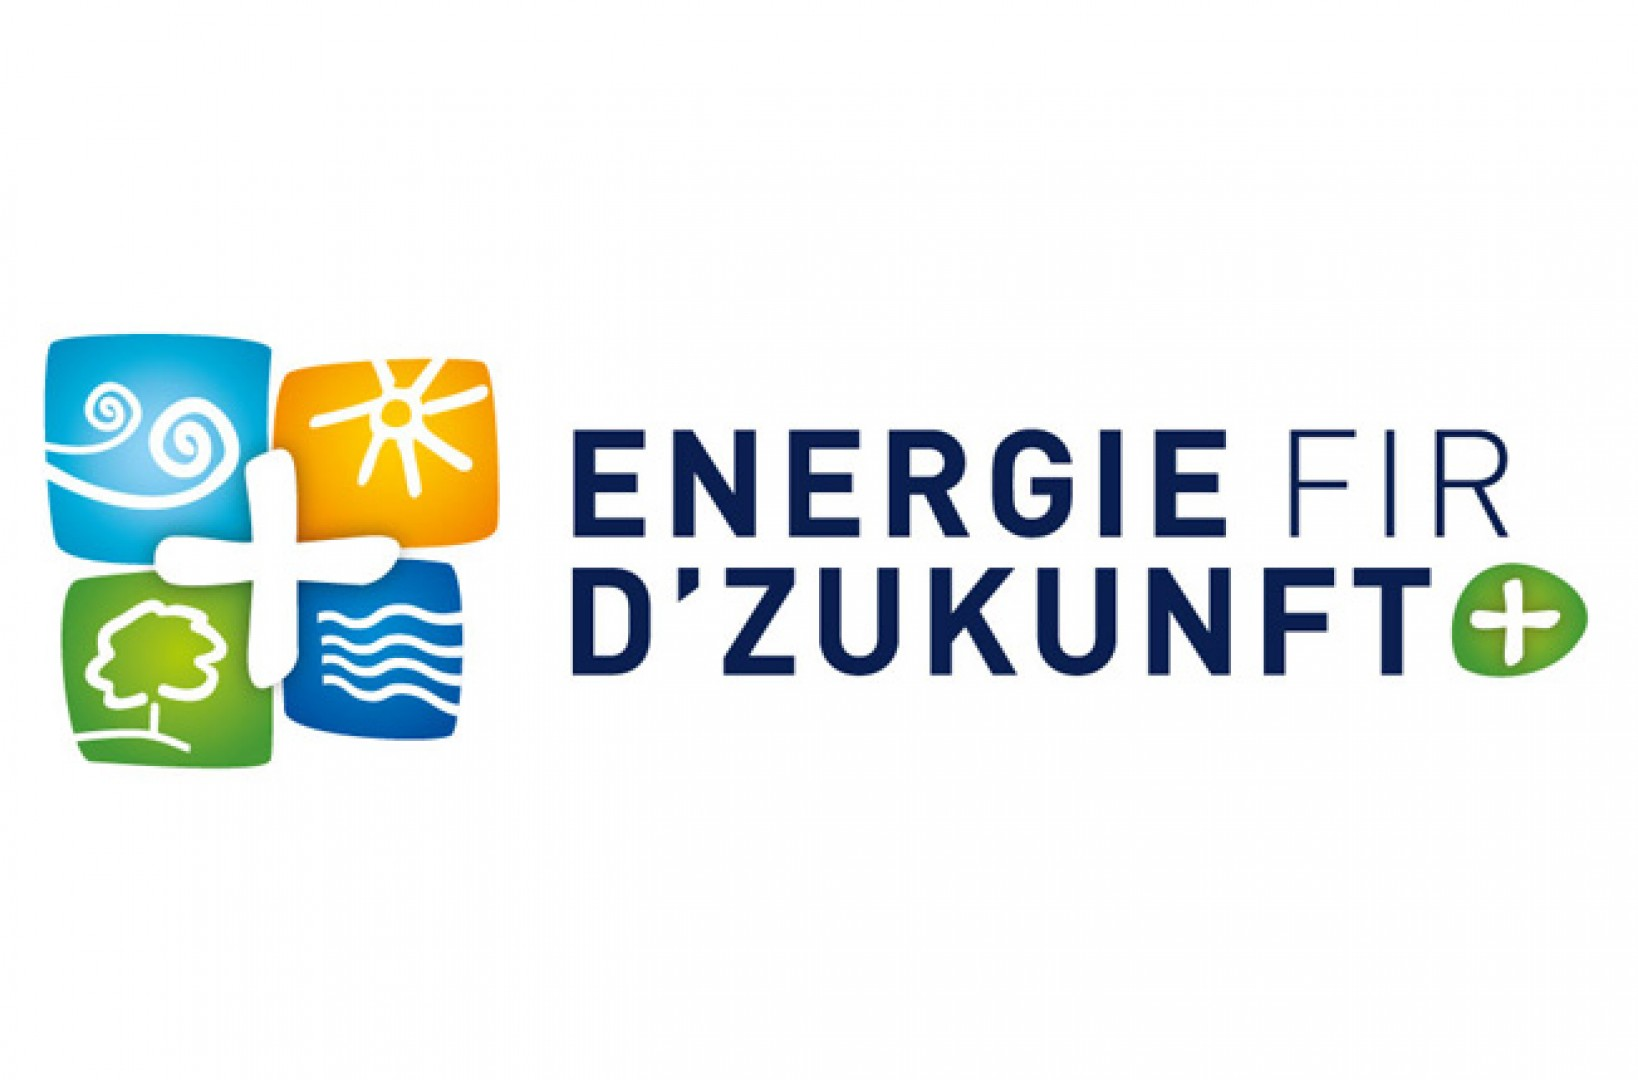 http://www.cdm.lu/media/cache/6246_resized_1920_1080_90_56bb711809952_label-energie-fir-d-zukunft-_news.jpg